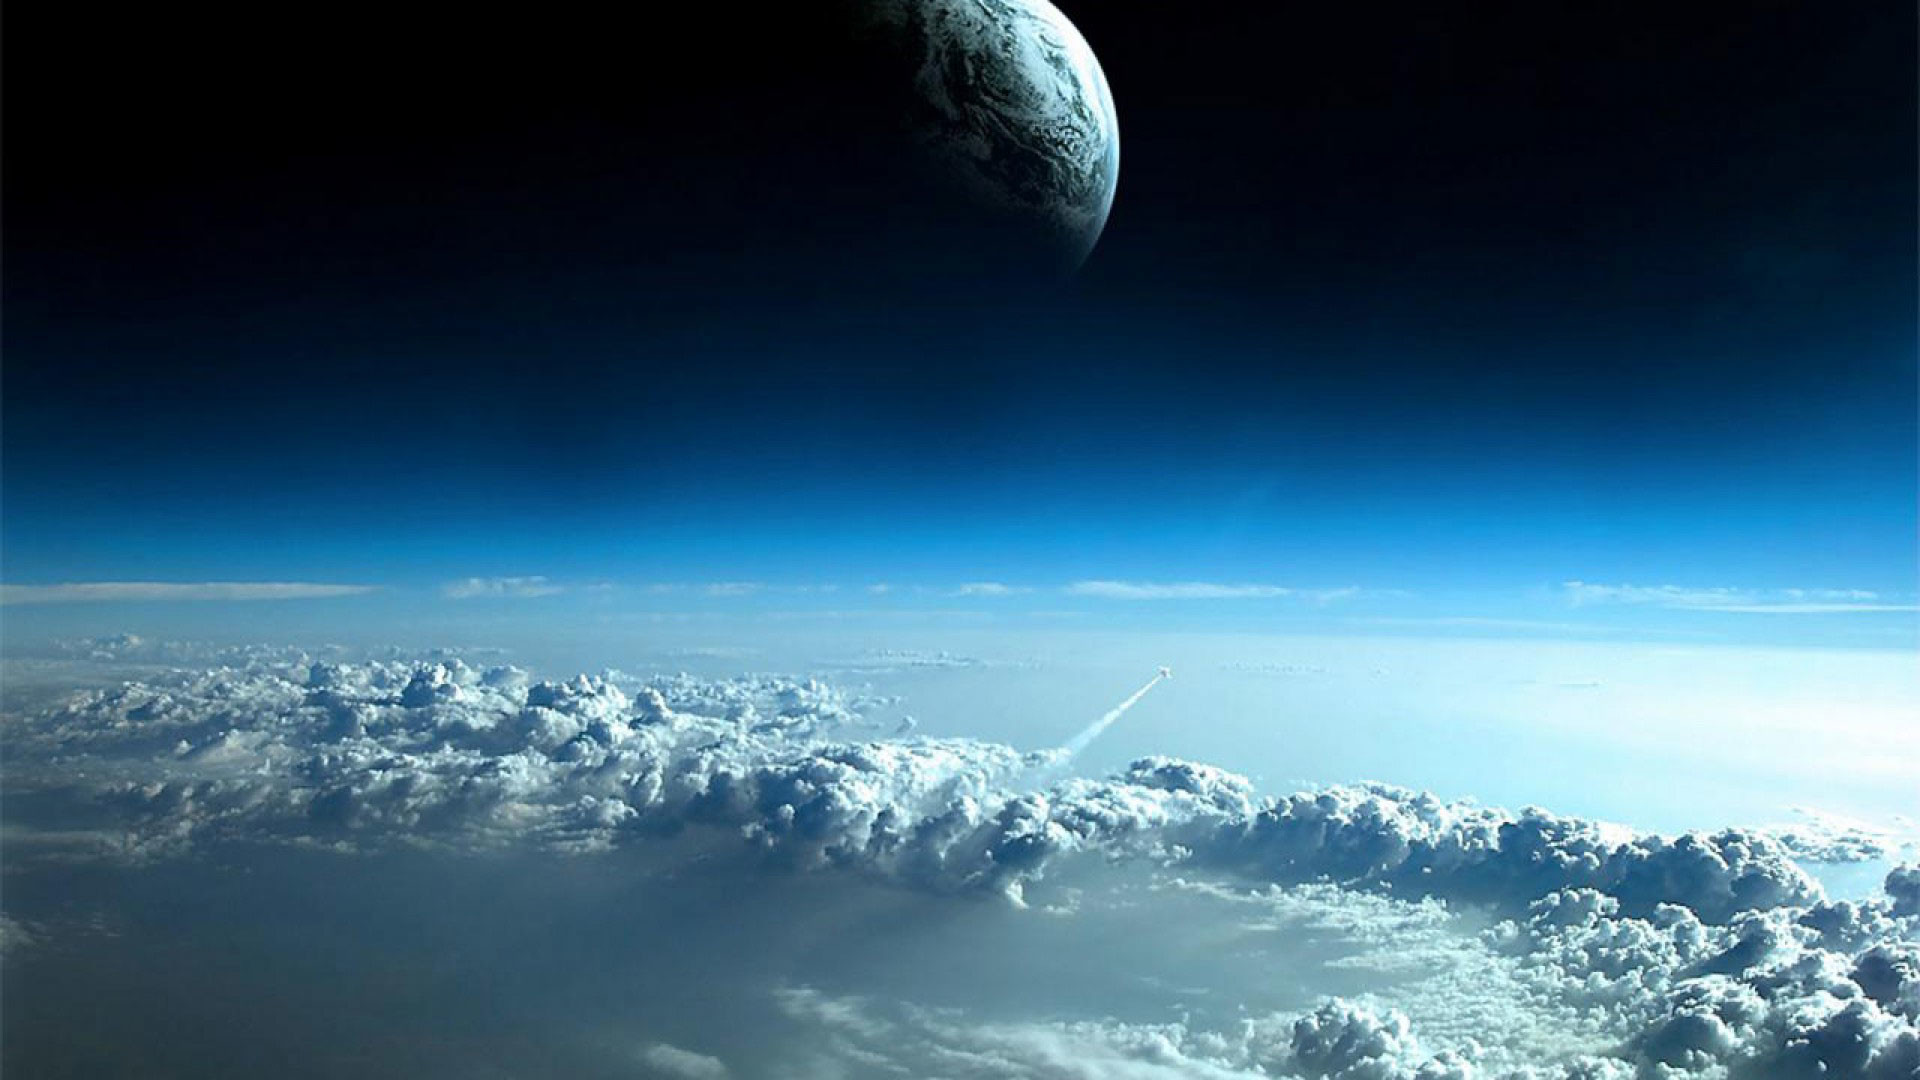 hd pics photos space planet clouds hd desktop background wallpaper